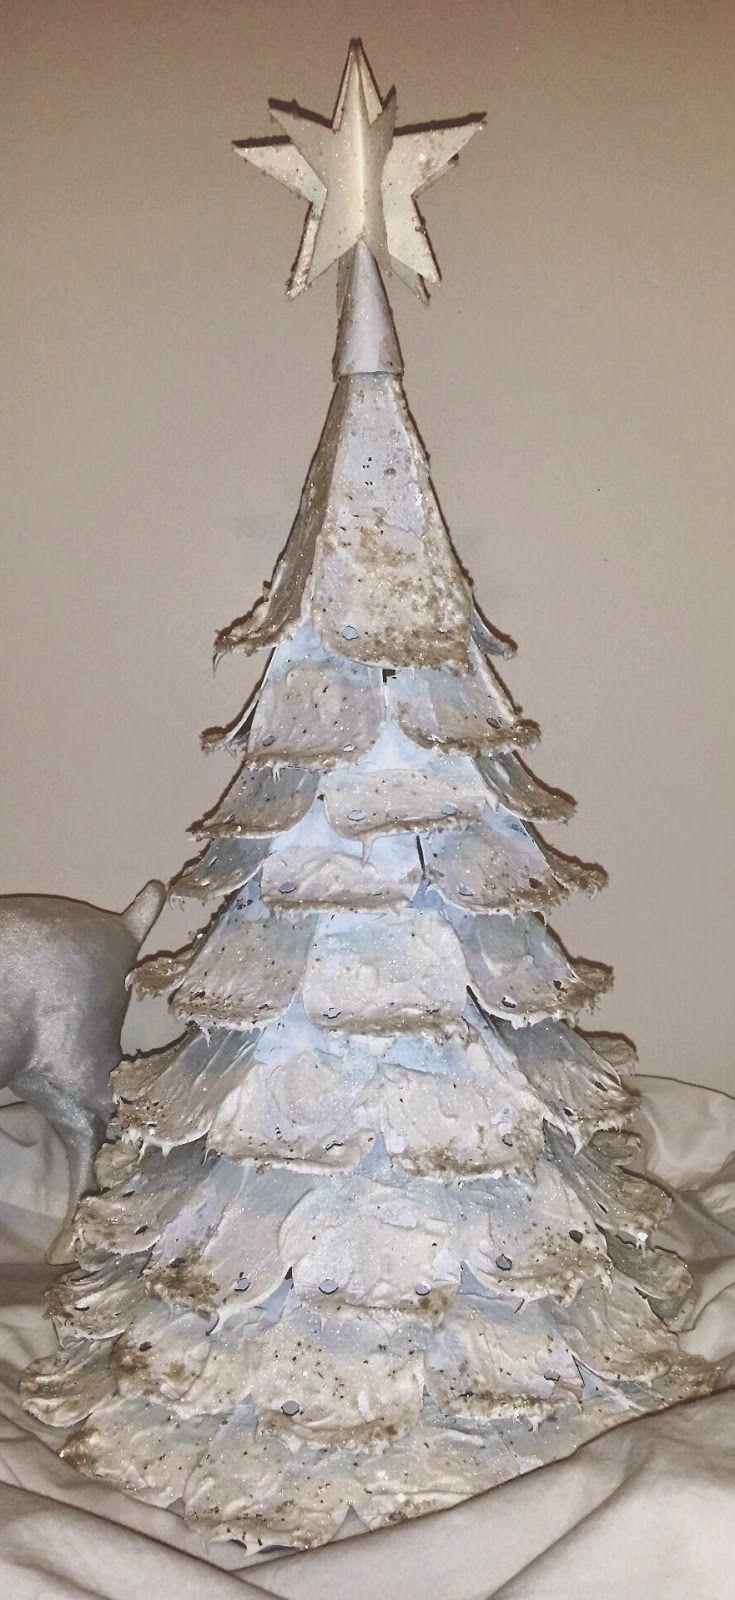 The Gentleman Crafter: Tim Holtz Petal Drop Die Wintry Wonderland Tree Done!